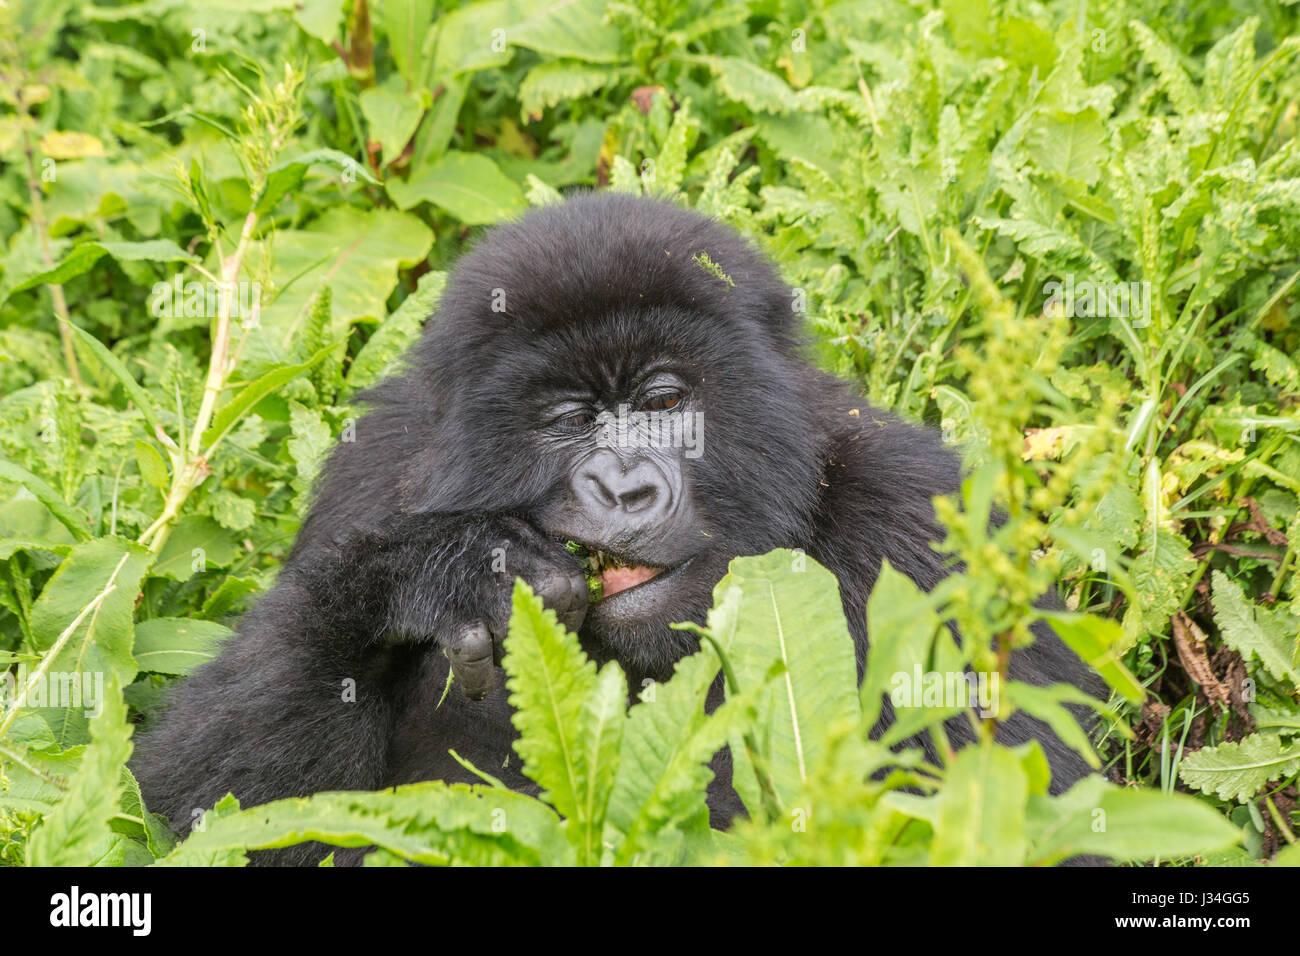 Critically endangered young mountain gorilla (Gorilla beringei beringei) of the Agashya group, taken in the Volcanoes - Stock Image